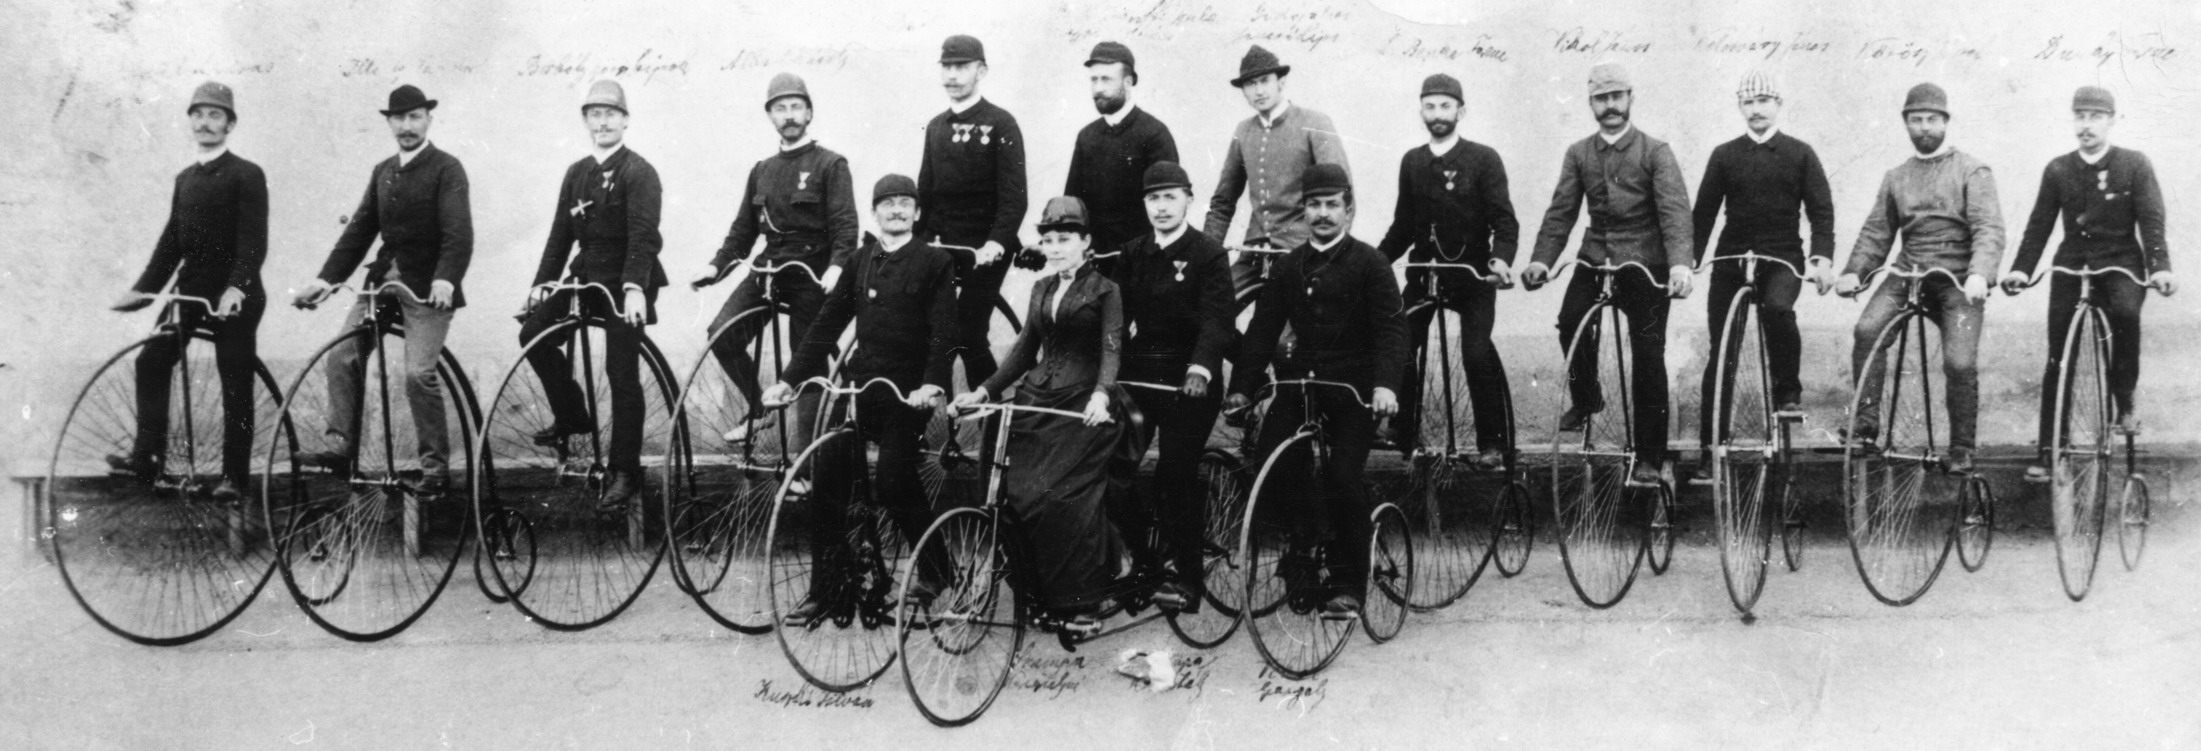 kerekpar_kolozsvari_atletikai_club_bicycle_kore1888_resize.jpg